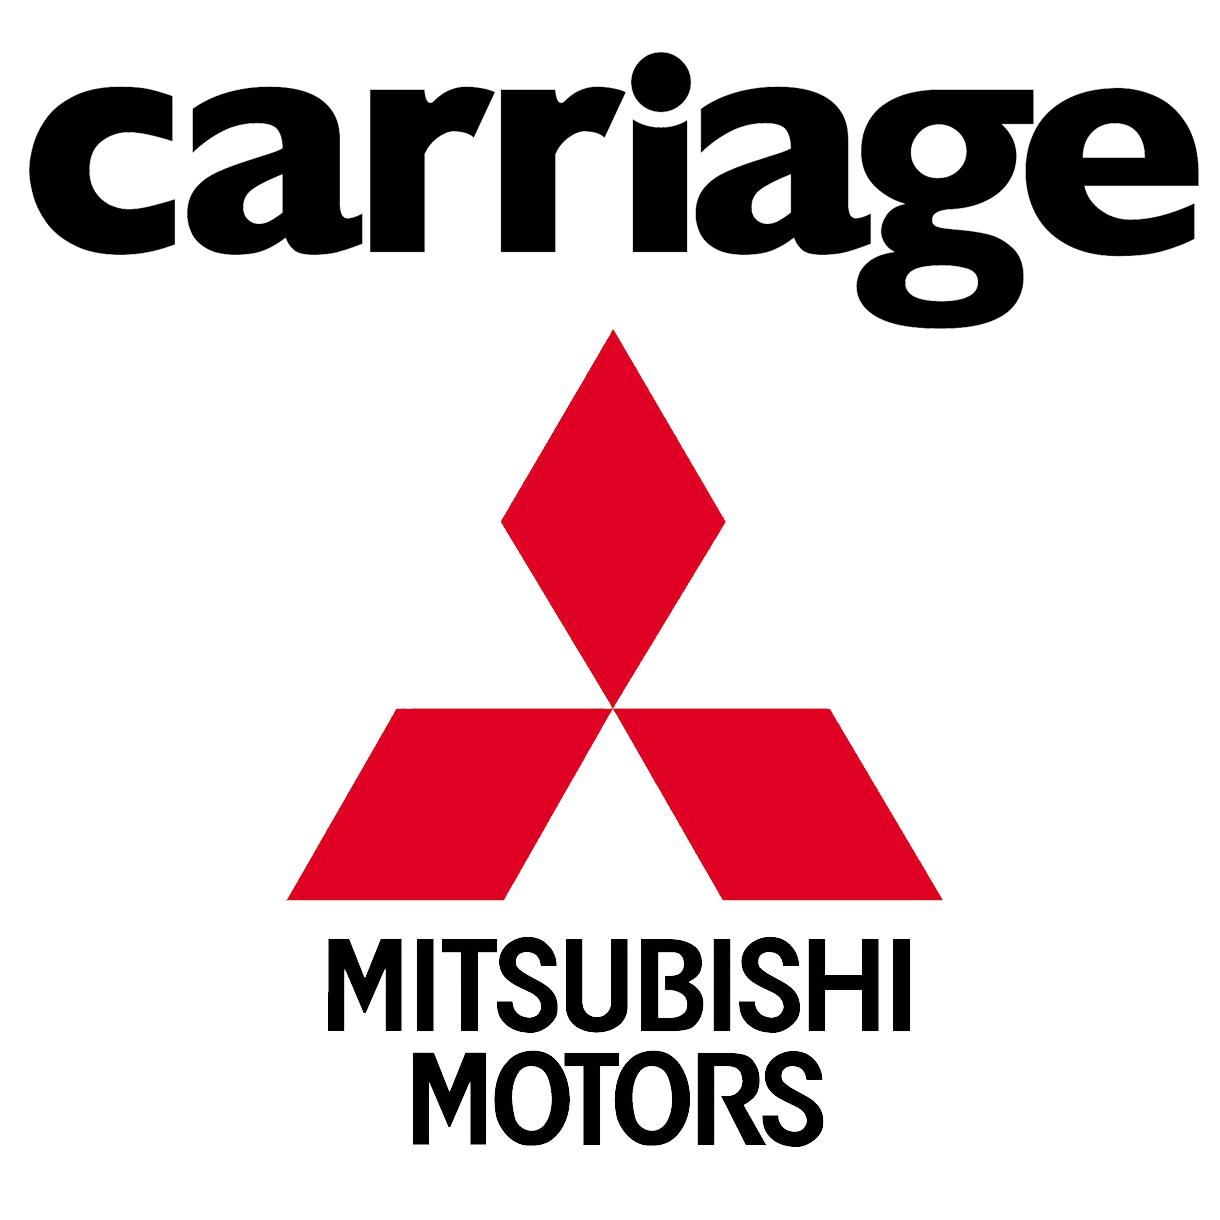 Carriage Mitsubishi